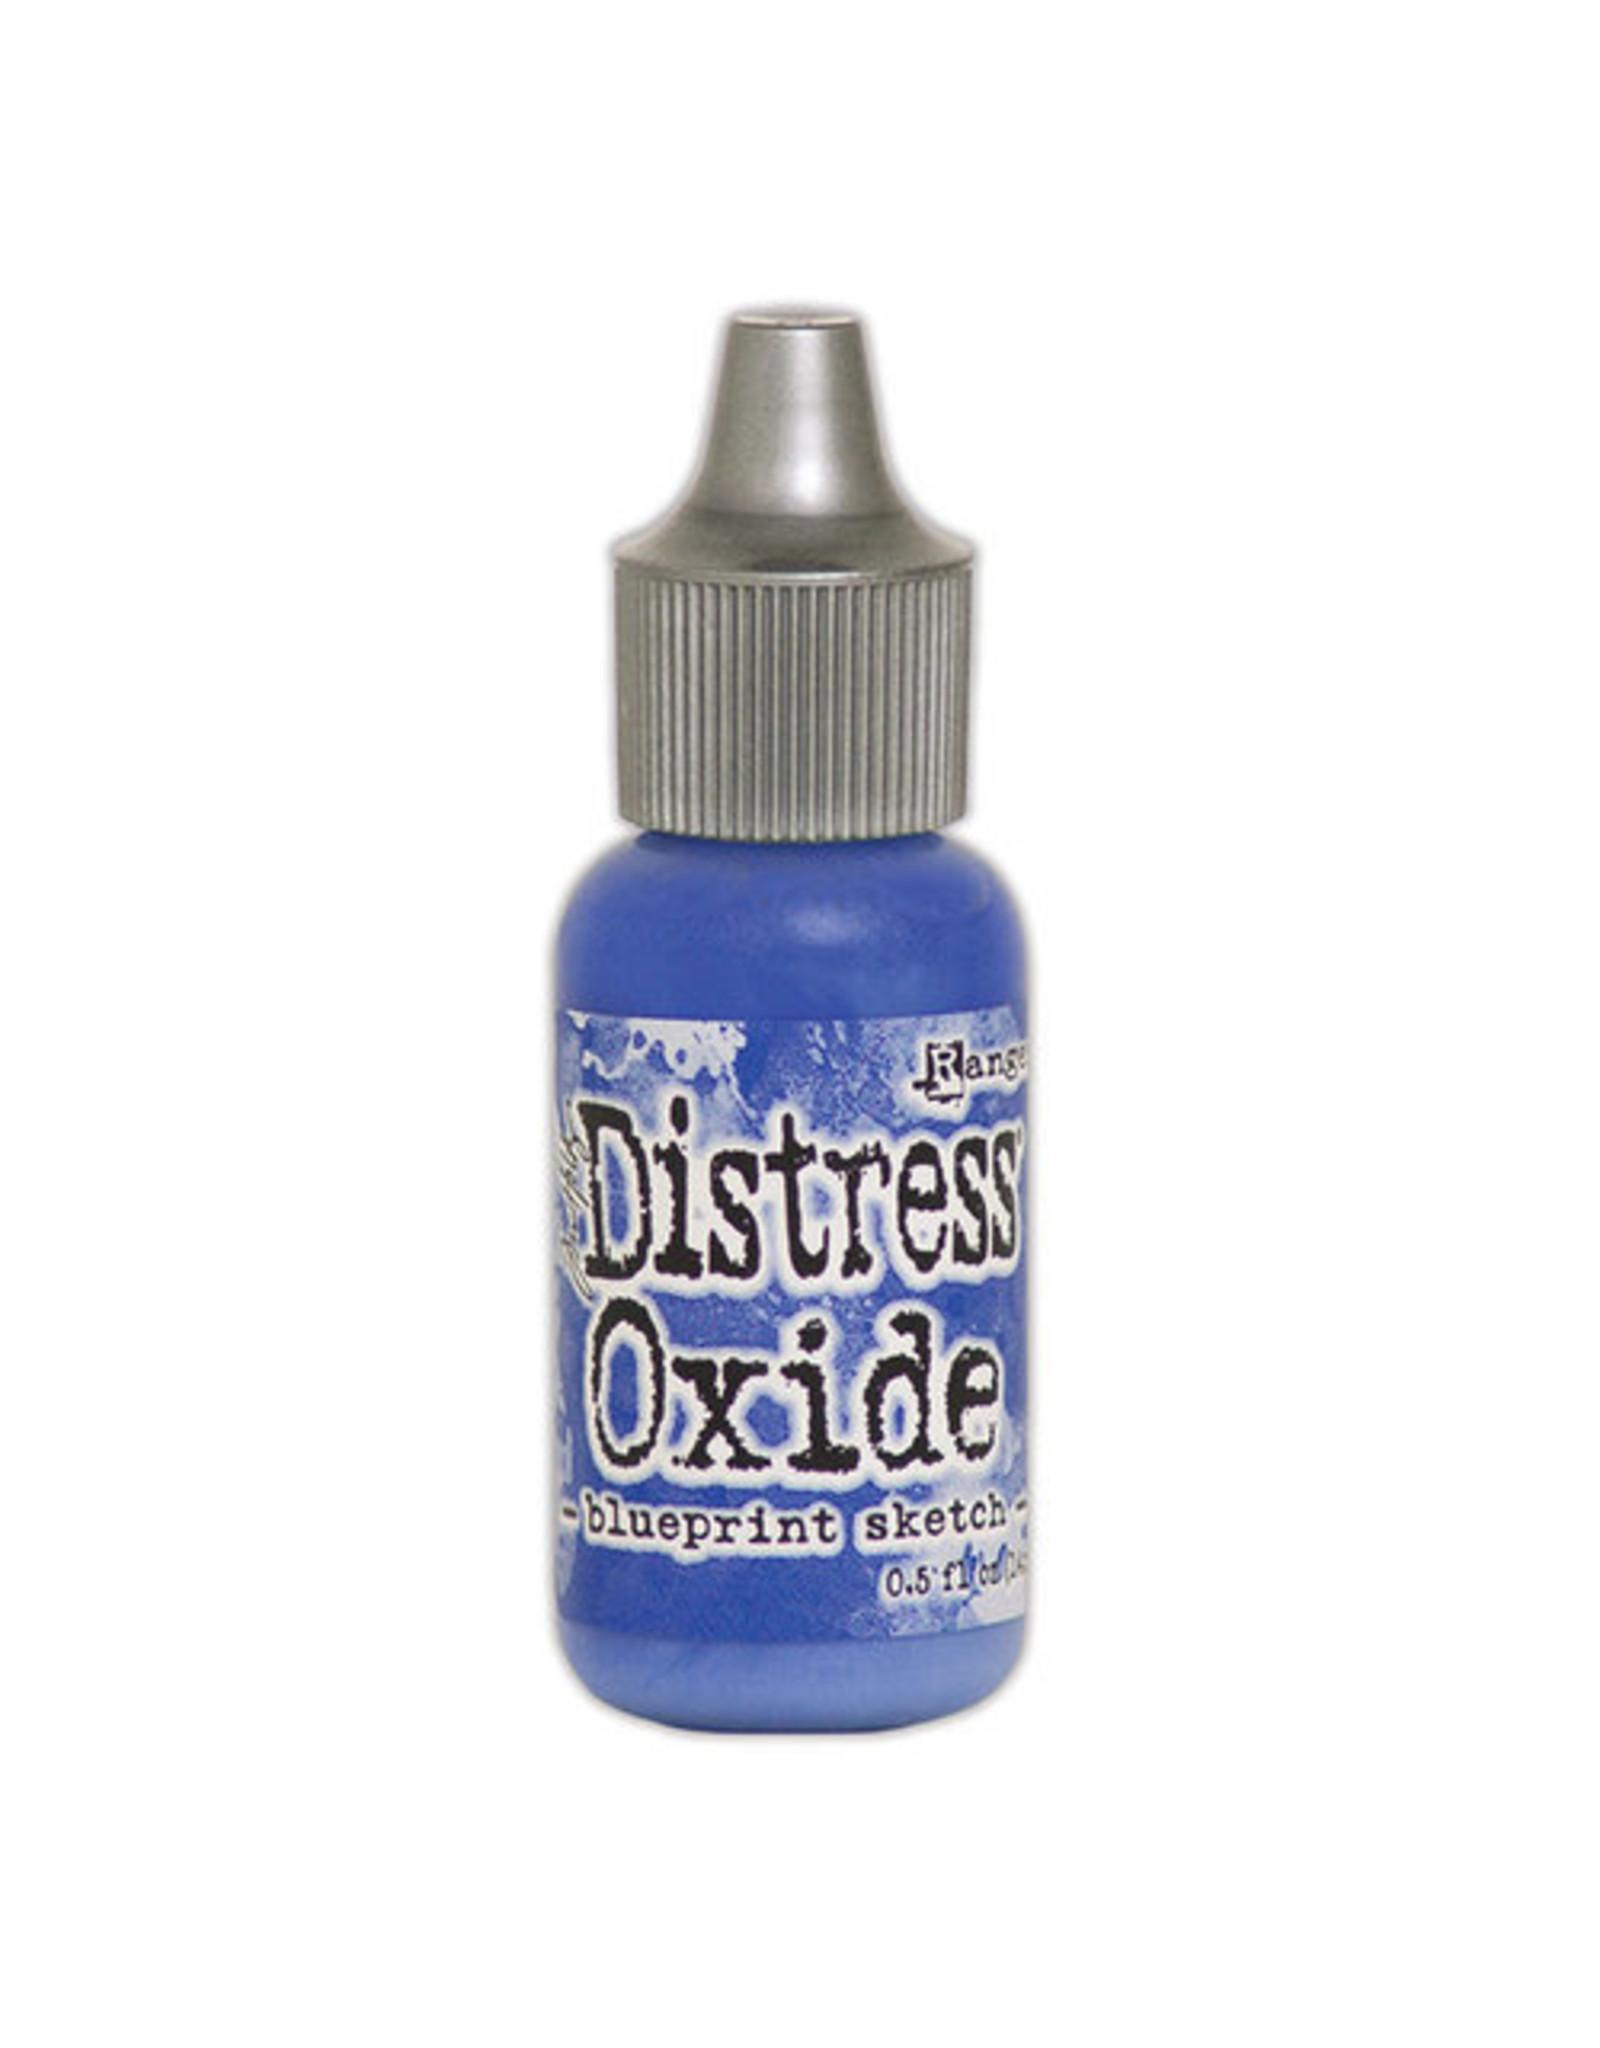 Ranger Distress Oxide Ink Reinker - Blueprint Sketch